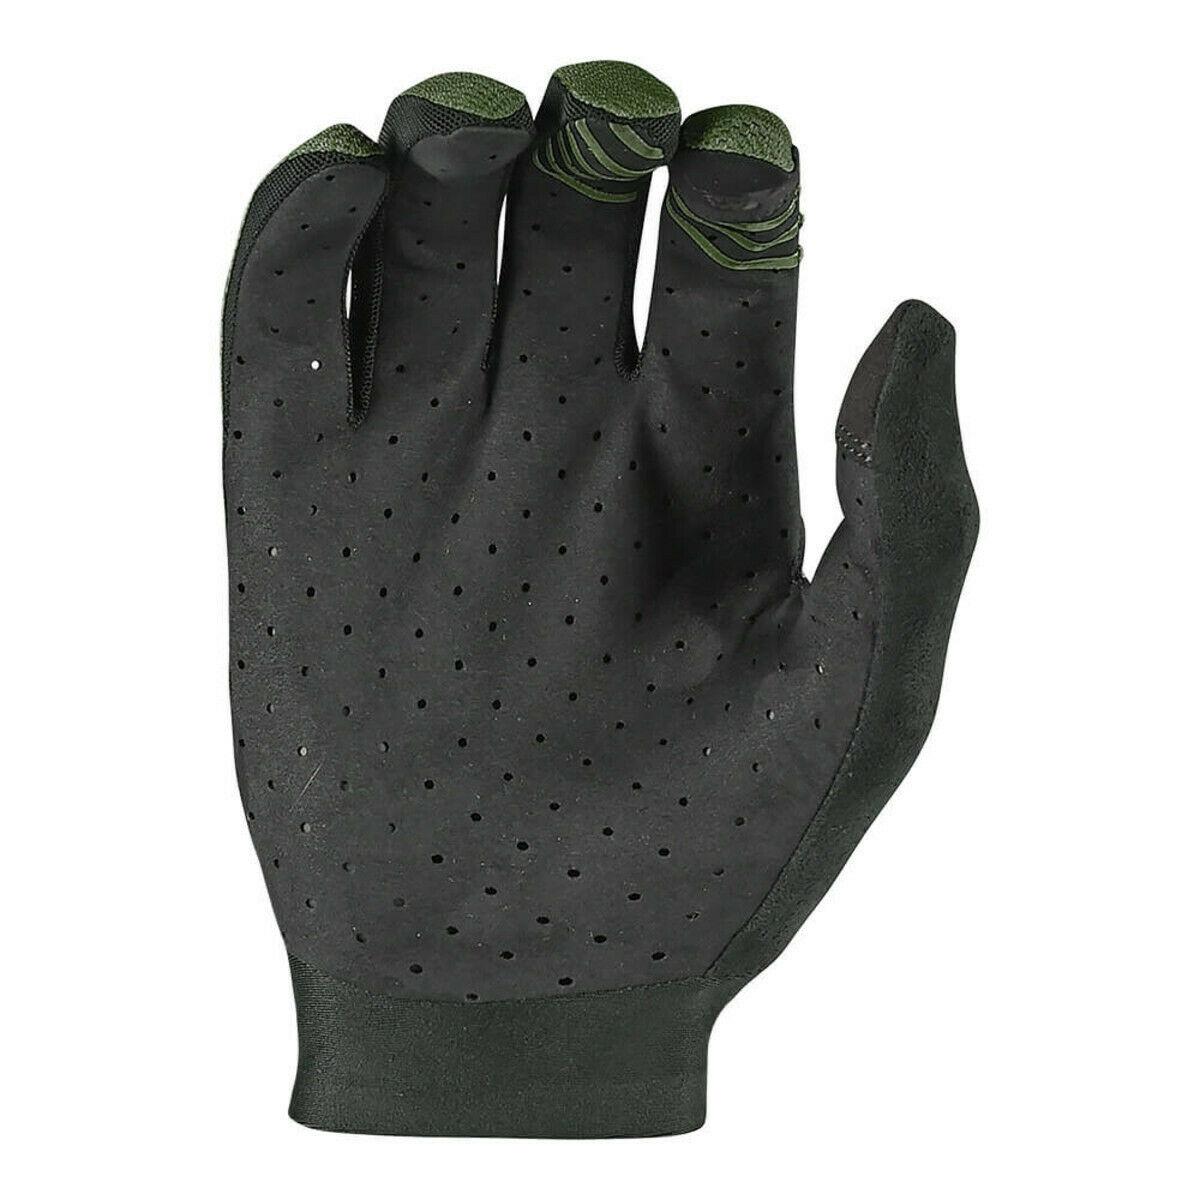 2XL Troy Lee Designs Trooper vert ACE 2.0 Cyclisme Gants-Adult Small